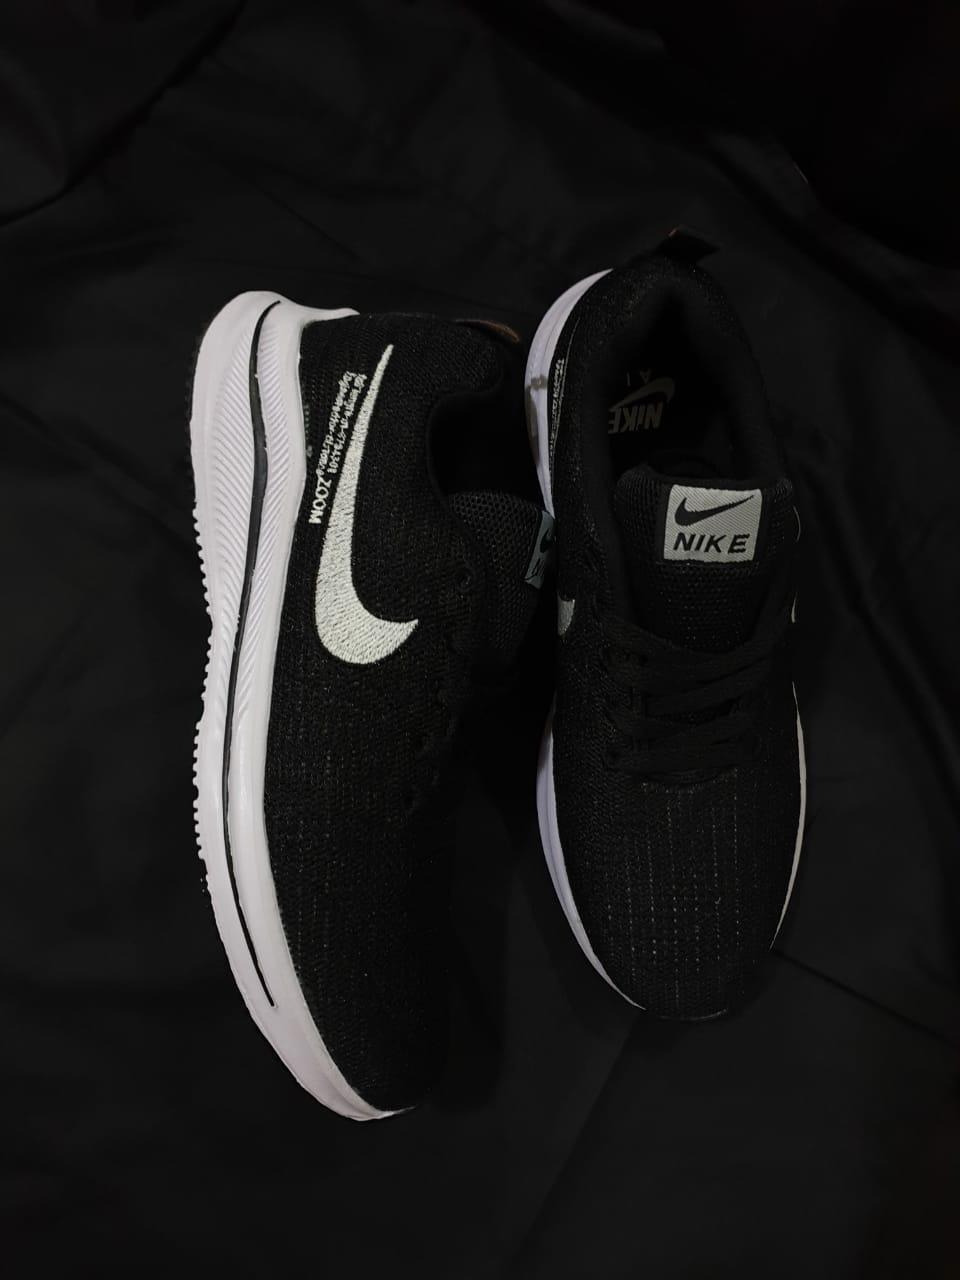 Sepatu Running Nike ZOOM New Edition Best Quality Import Harga Murah